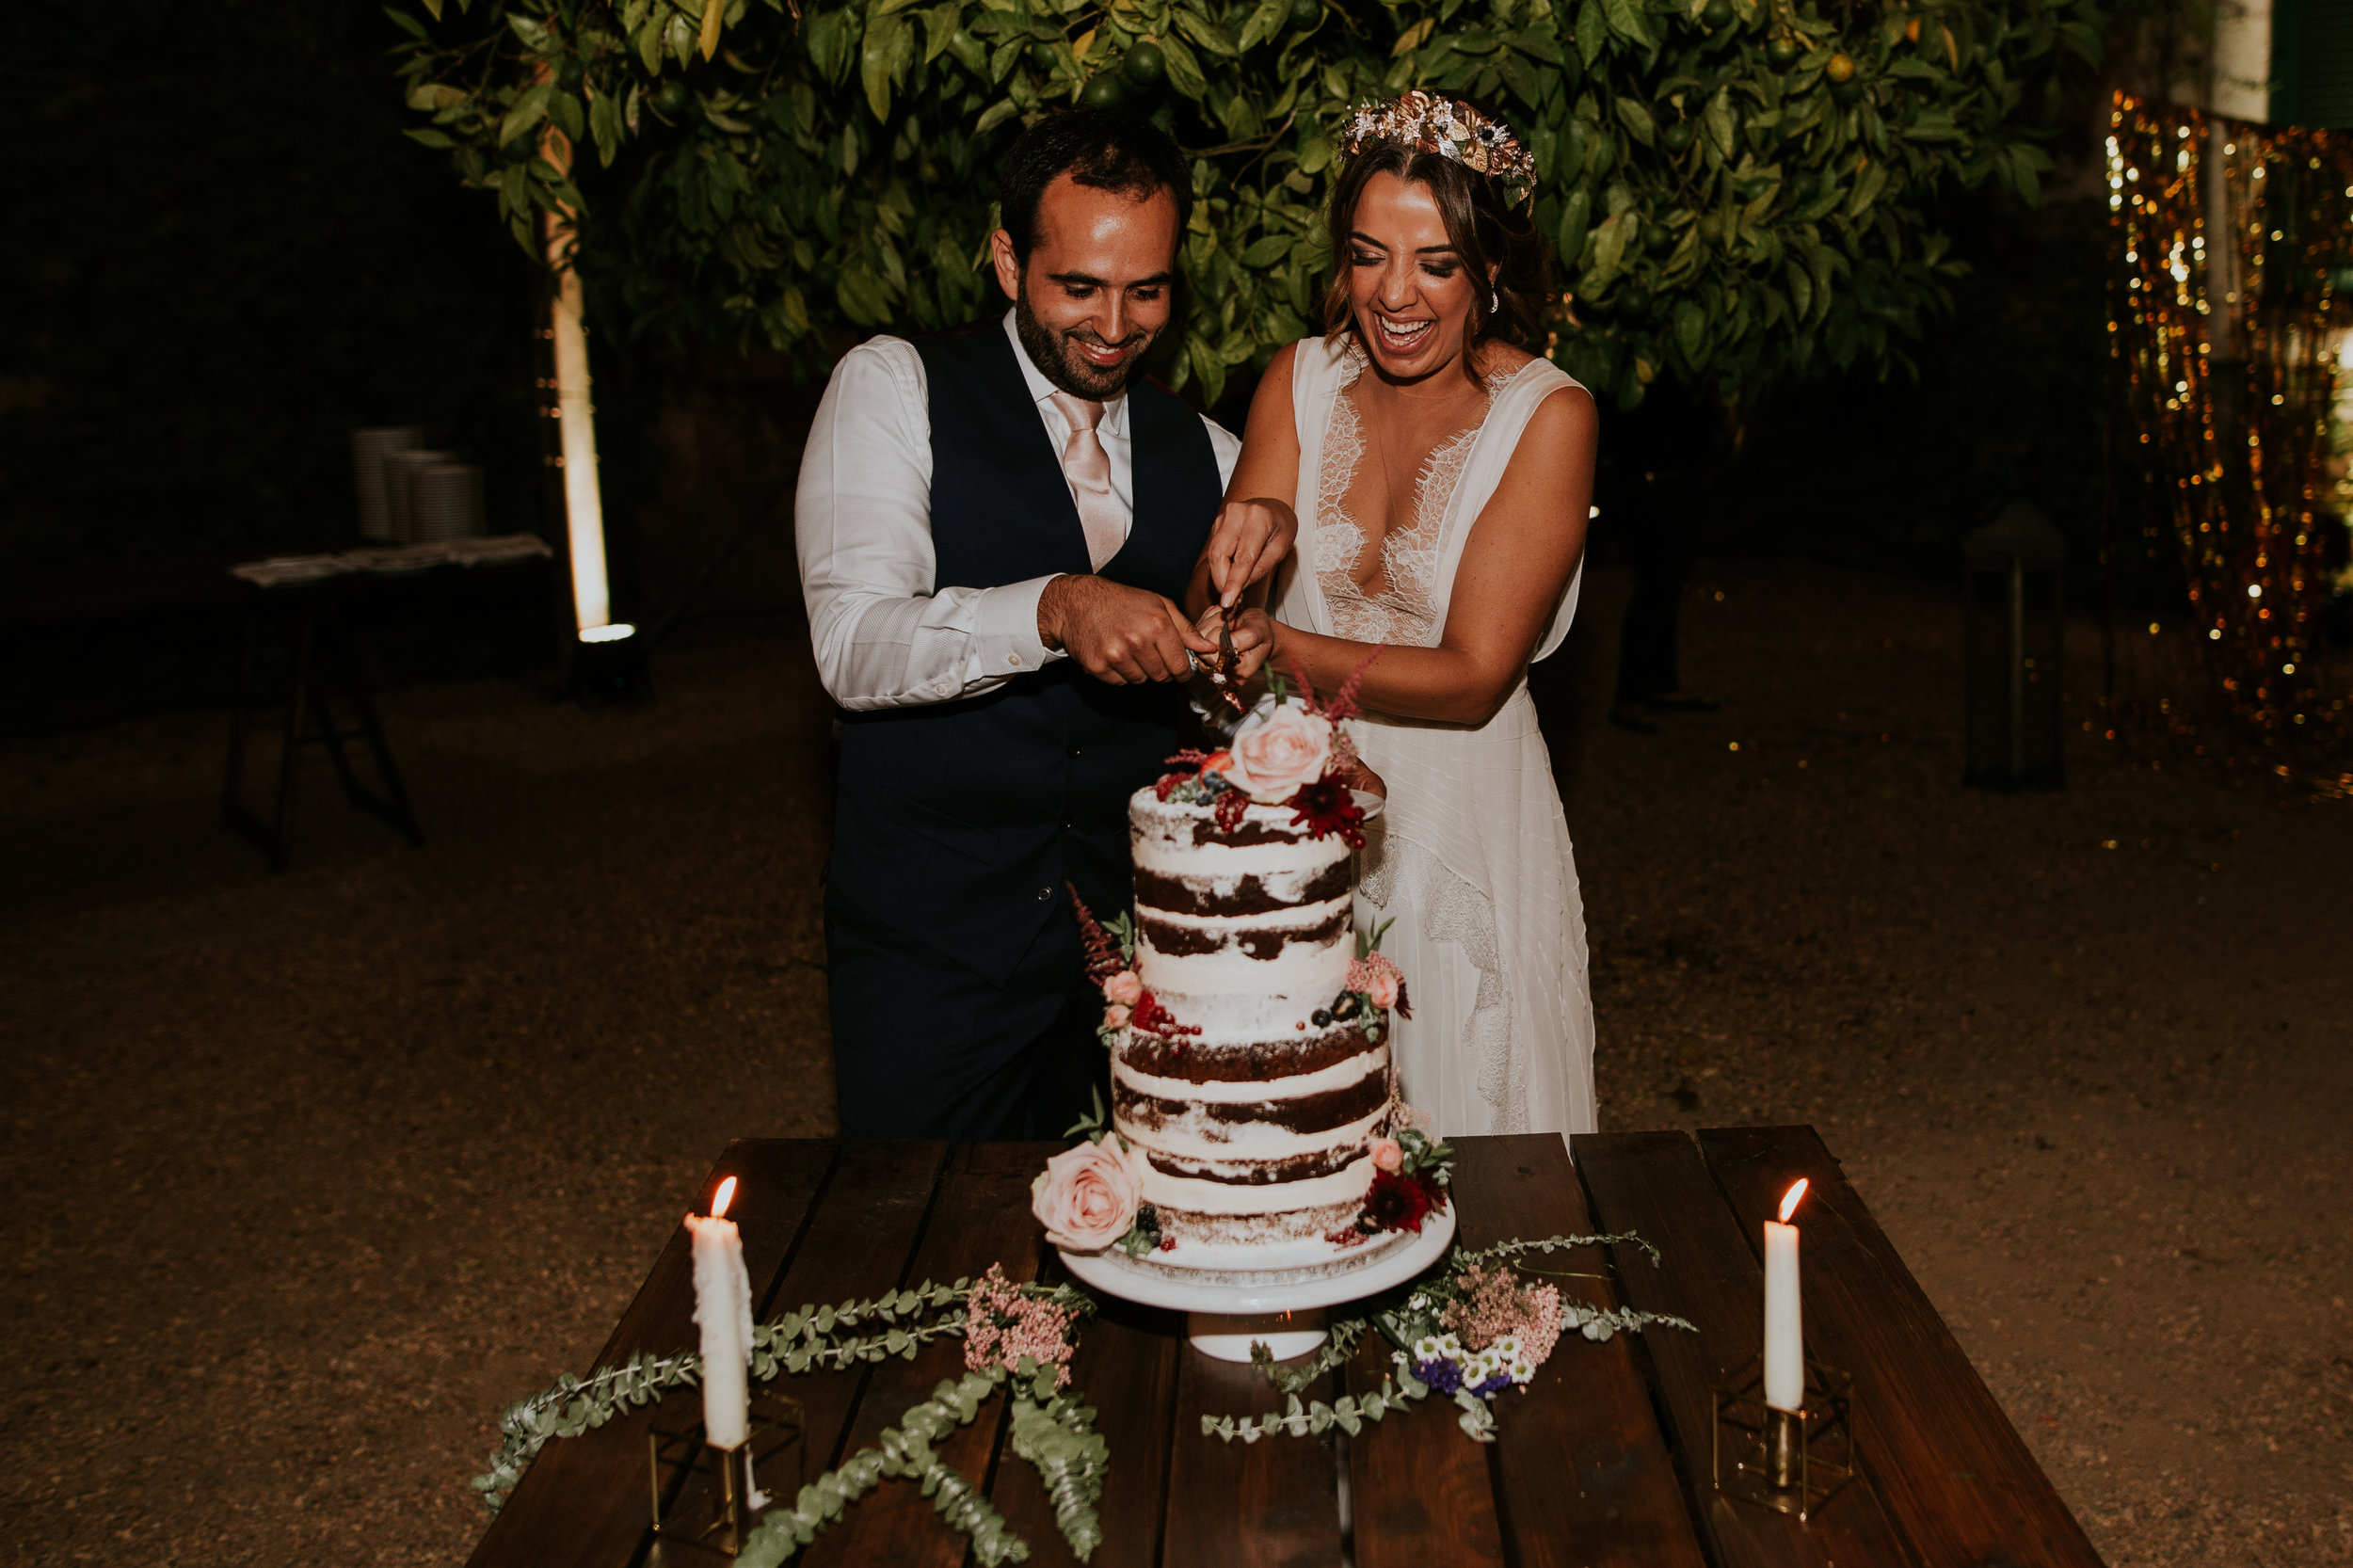 R&J888_ 09 setembro 2017 Wedding day_.jpg